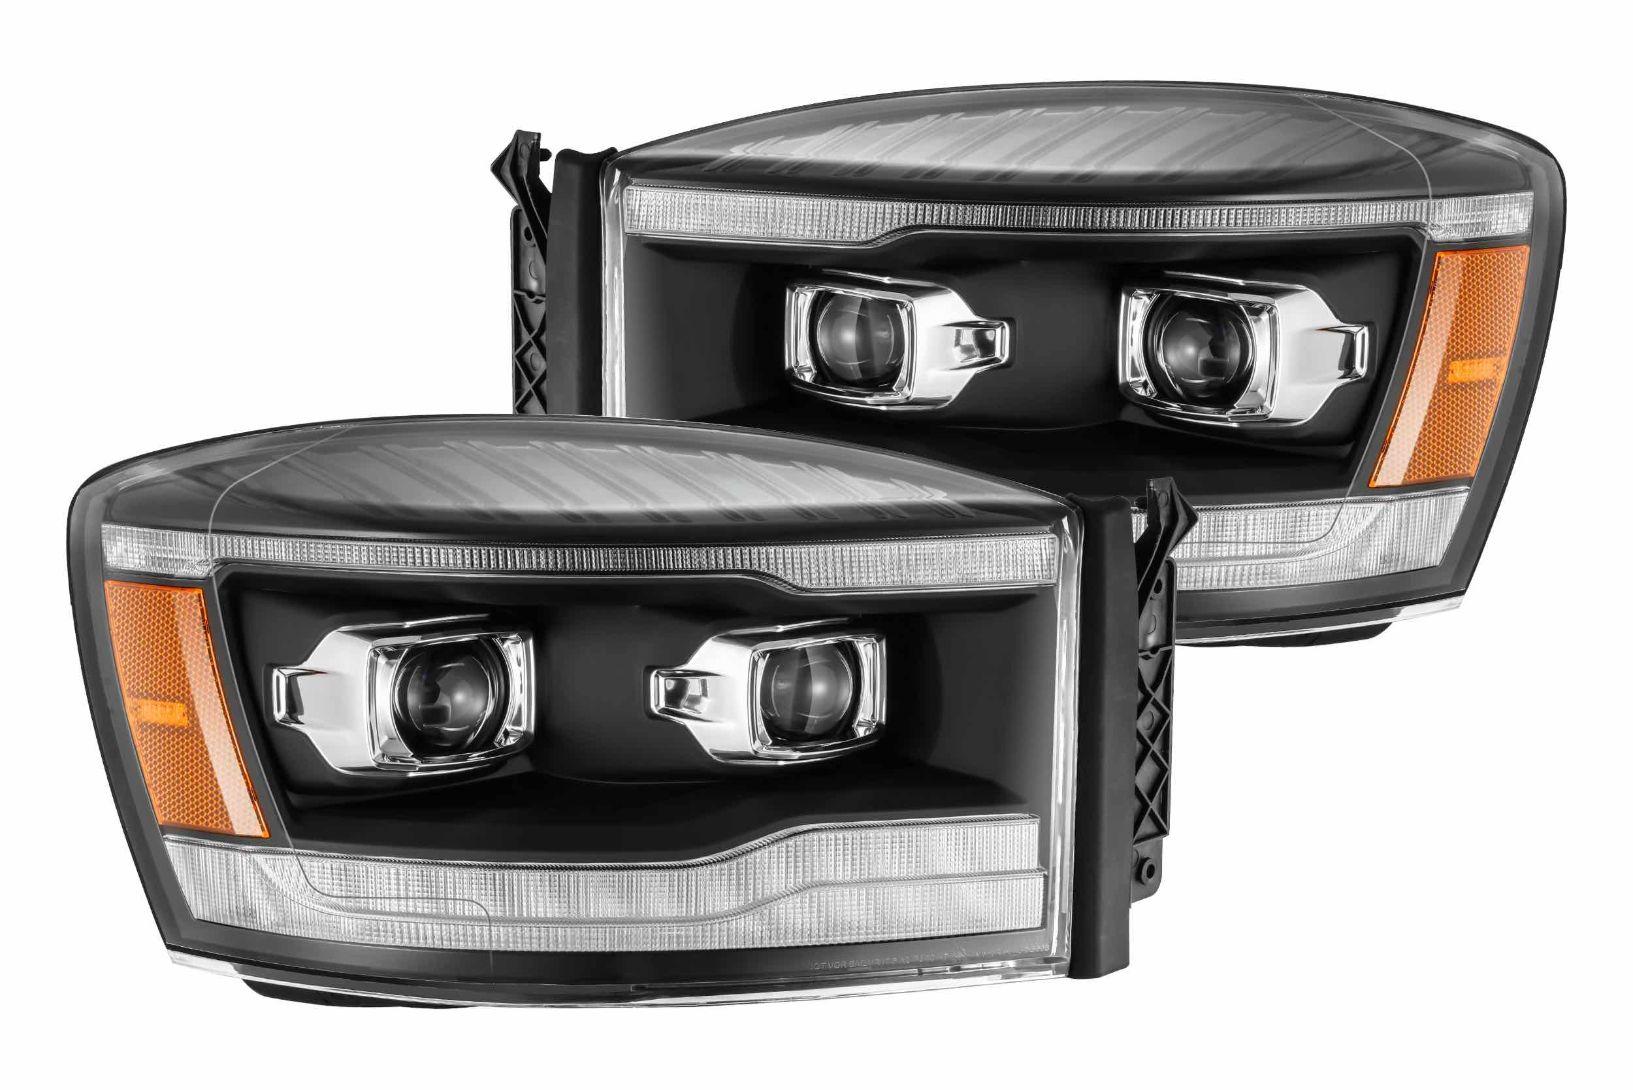 Built-In LED 2002-2008 Dodge RAM 1500 Truck Halo Projector Lamp Fog Lights Kit